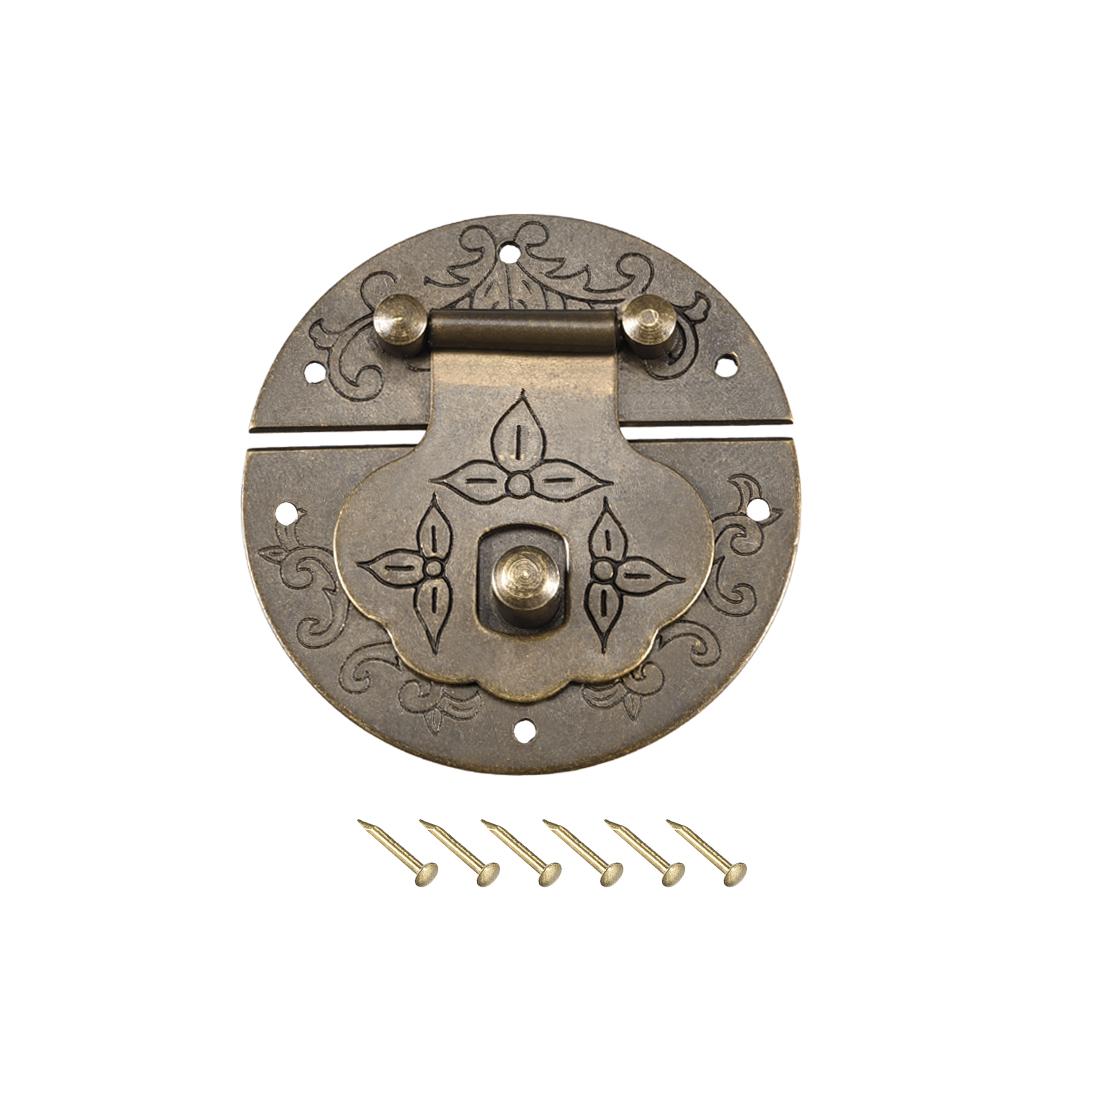 Wood Case Box Round Hasp 42x8.5mm Closure Brass Antique Latches Bronze Tone